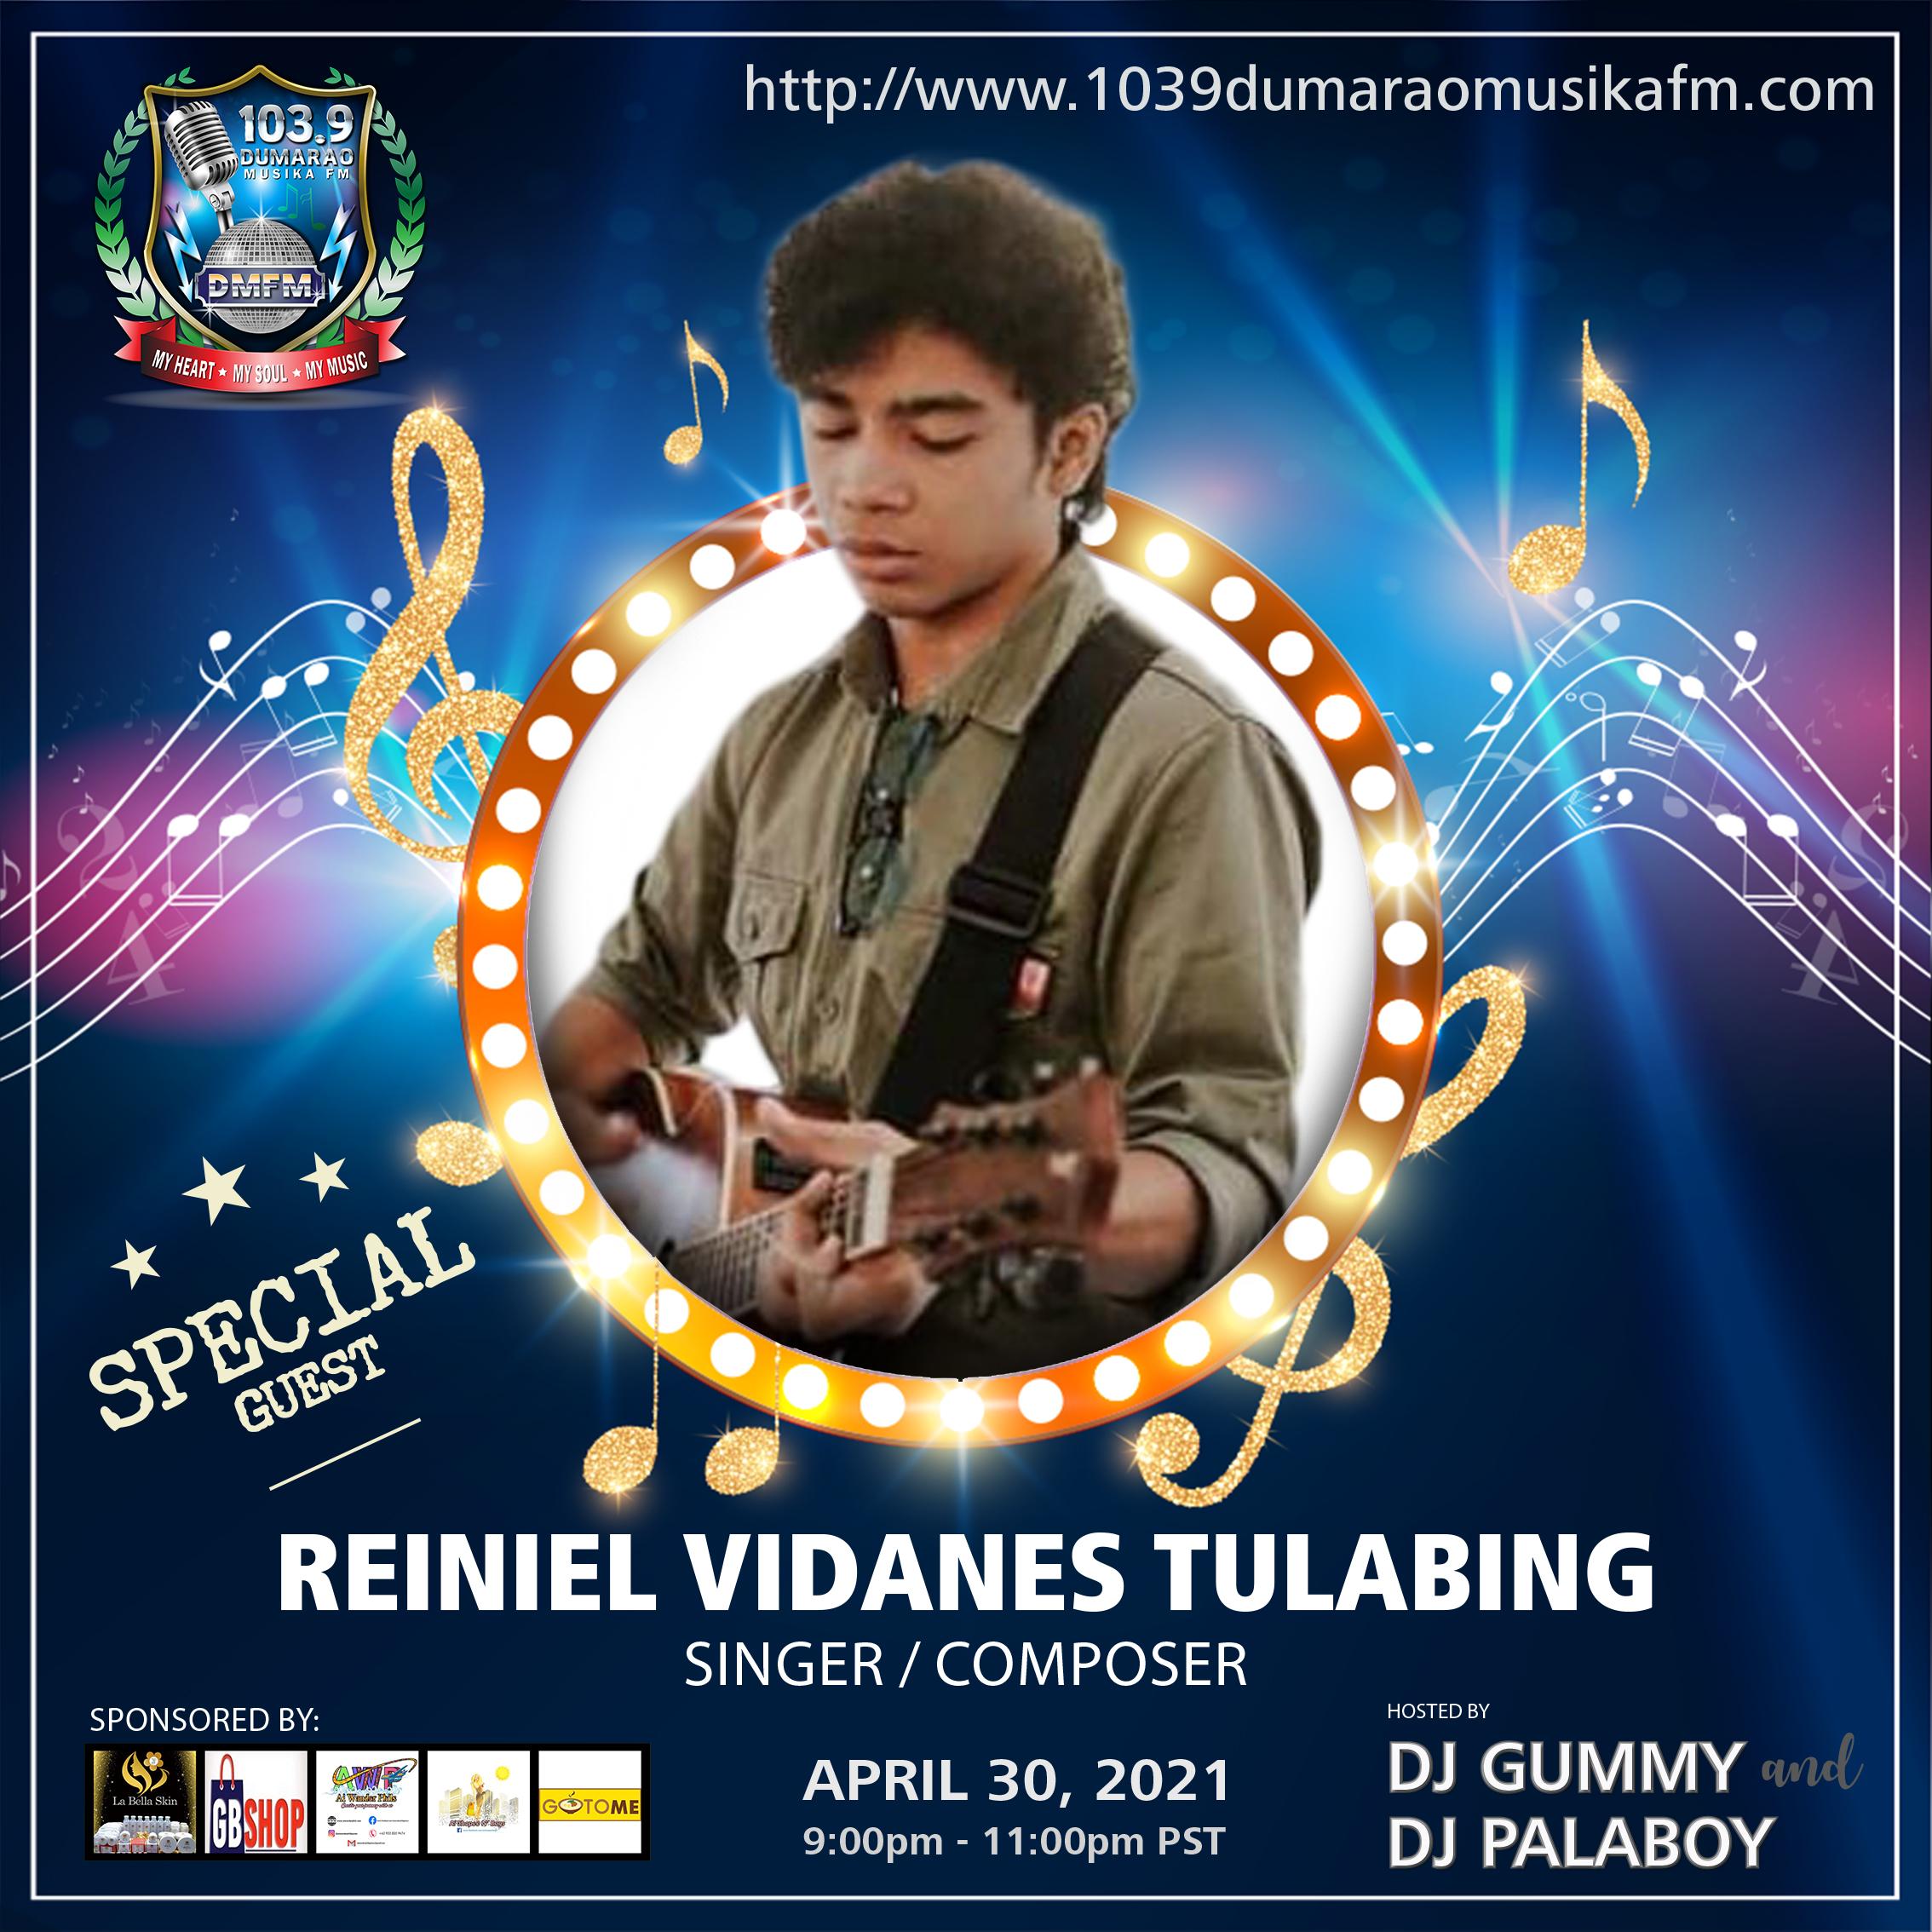 Reiniel-Vidanes-Tulabing-banner